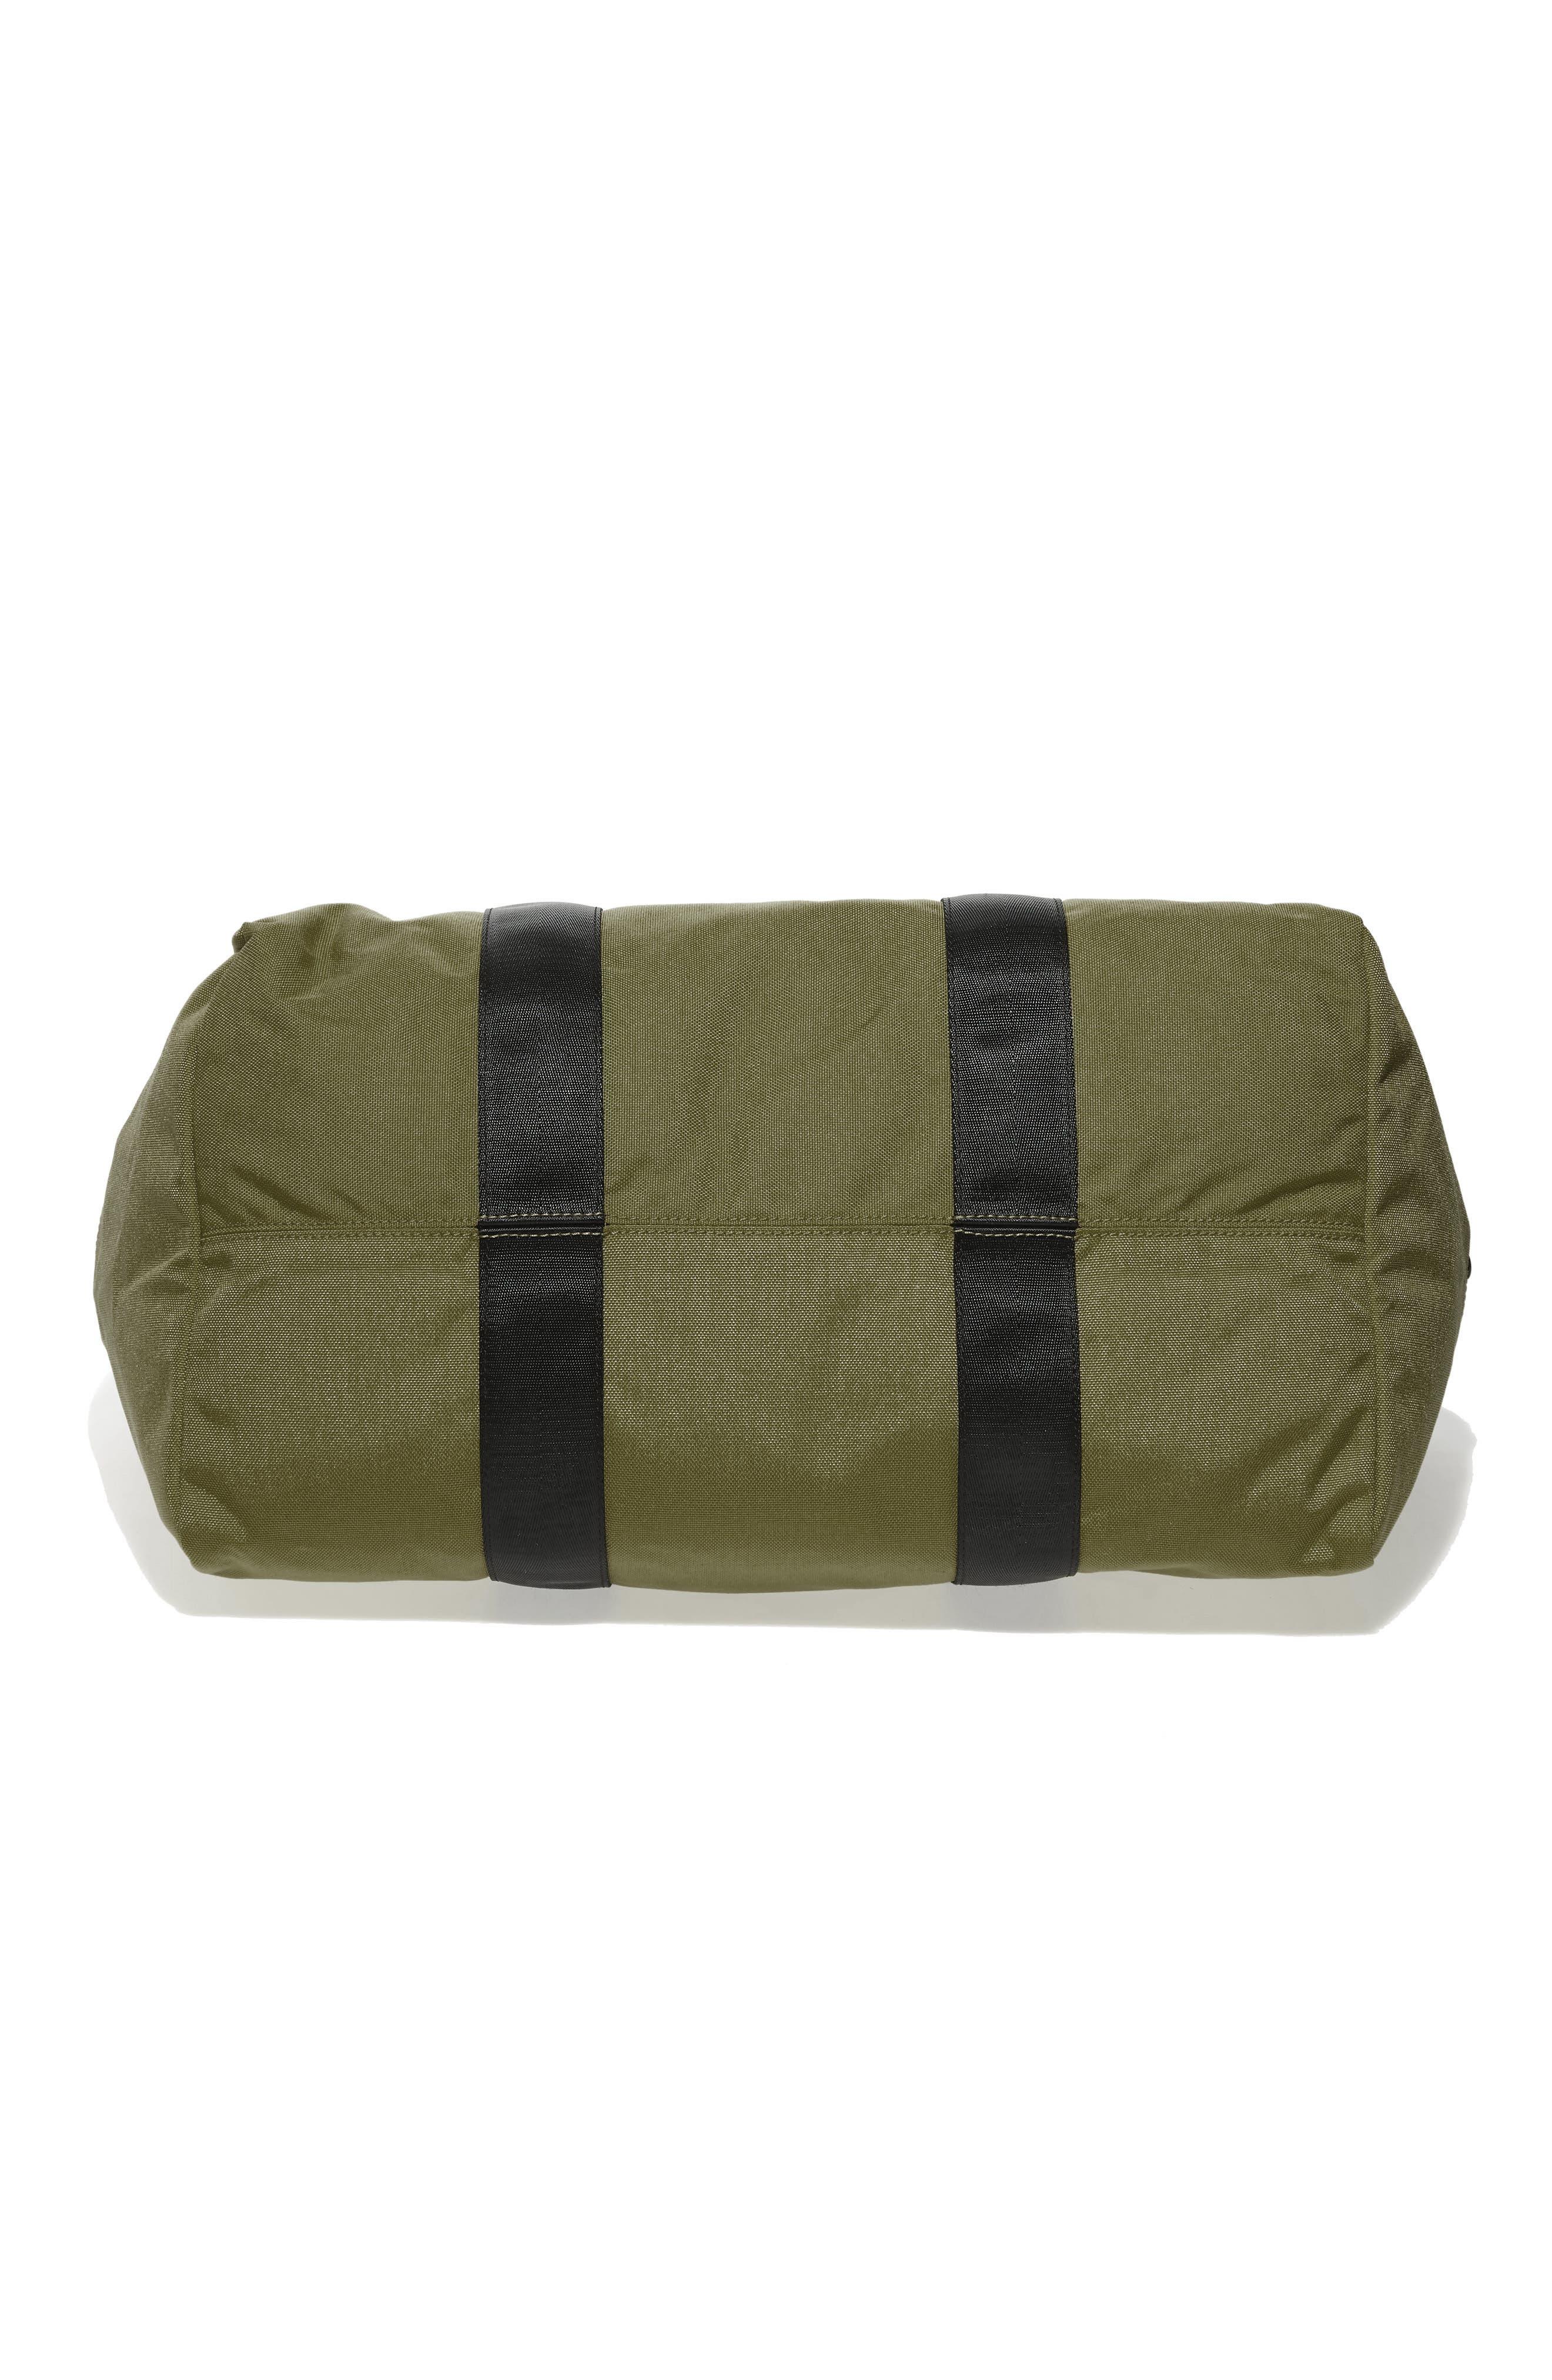 SWS 50L Roll Top Duffel Bag,                             Alternate thumbnail 6, color,                             OLIVE